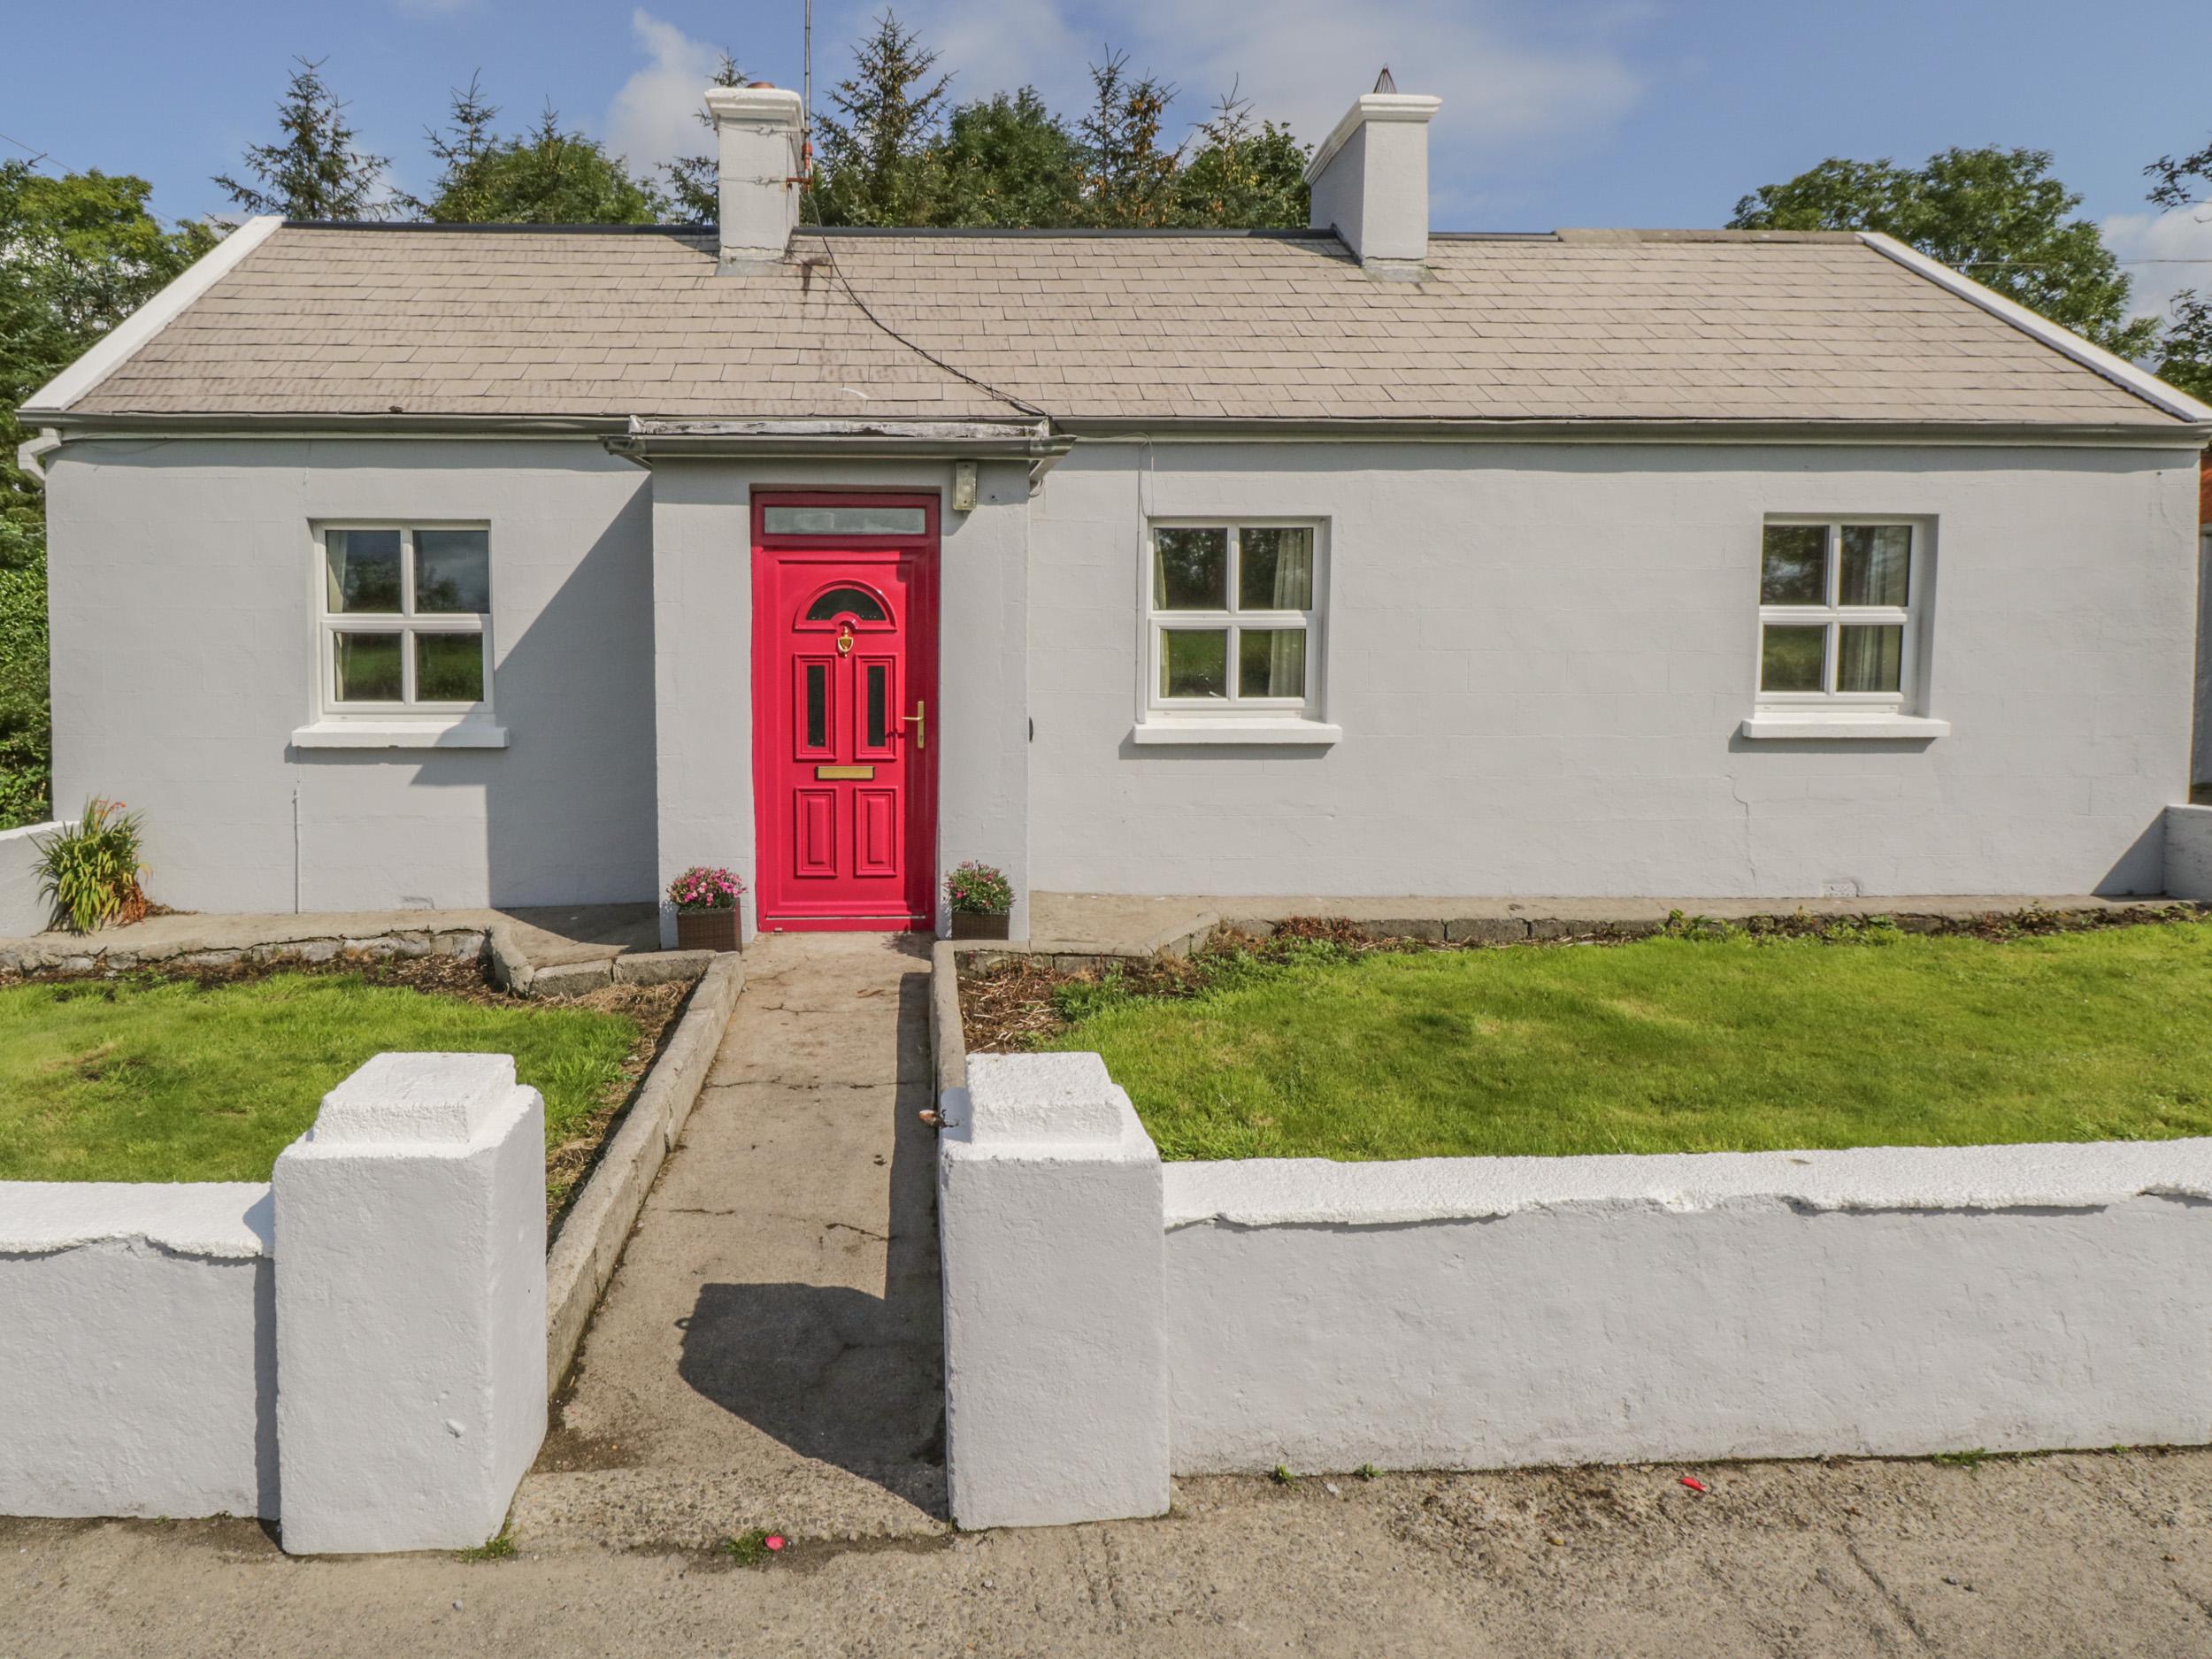 Cottage in County Sligo